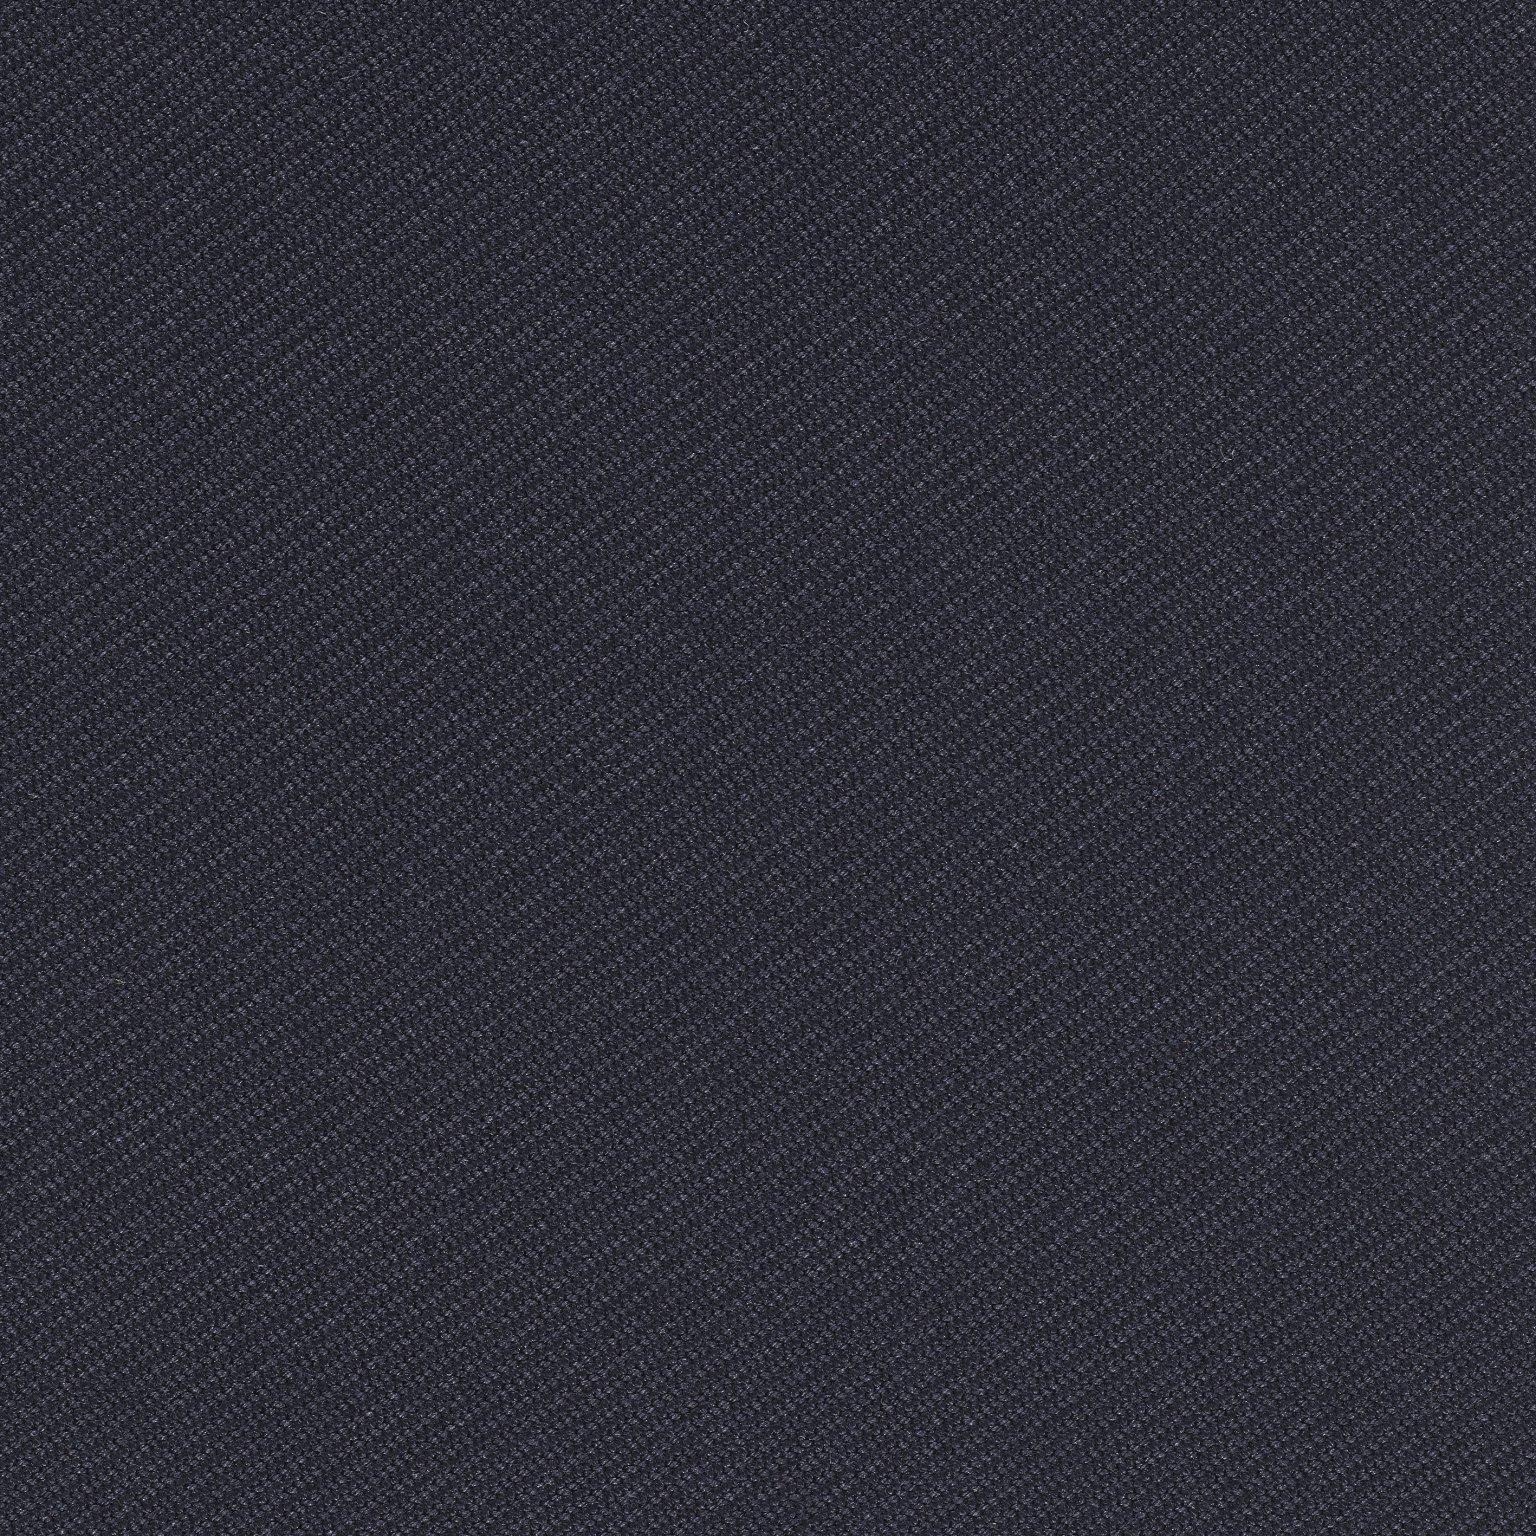 Kvadrat > Twill Weave 0790